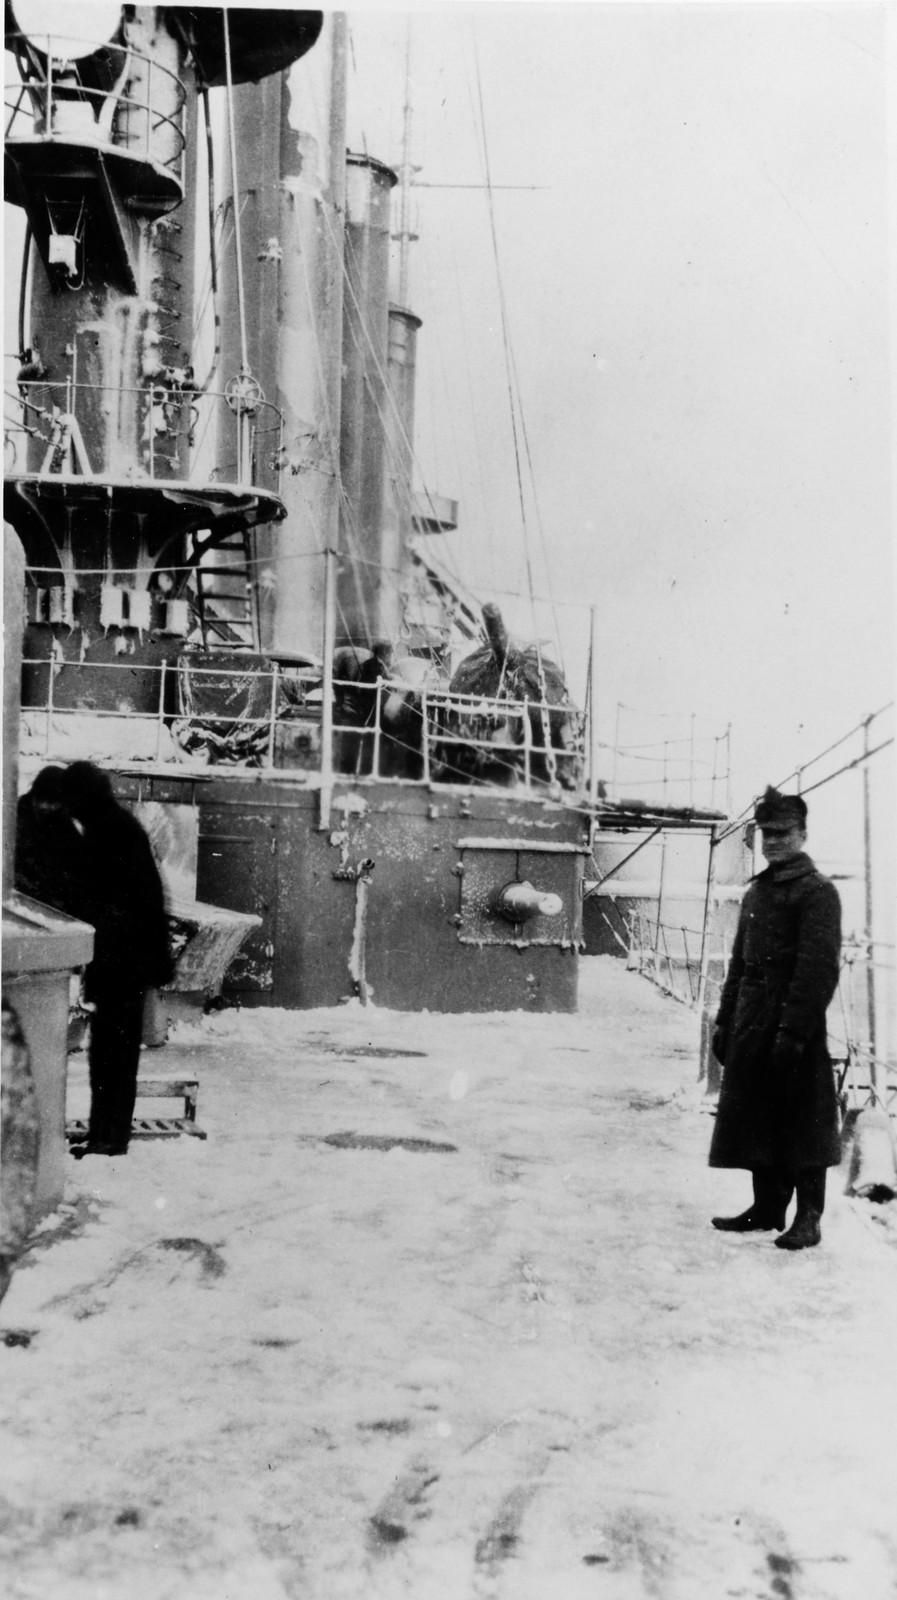 1918. Броненосный крейсер «Бруклин». Обледенелая палуба